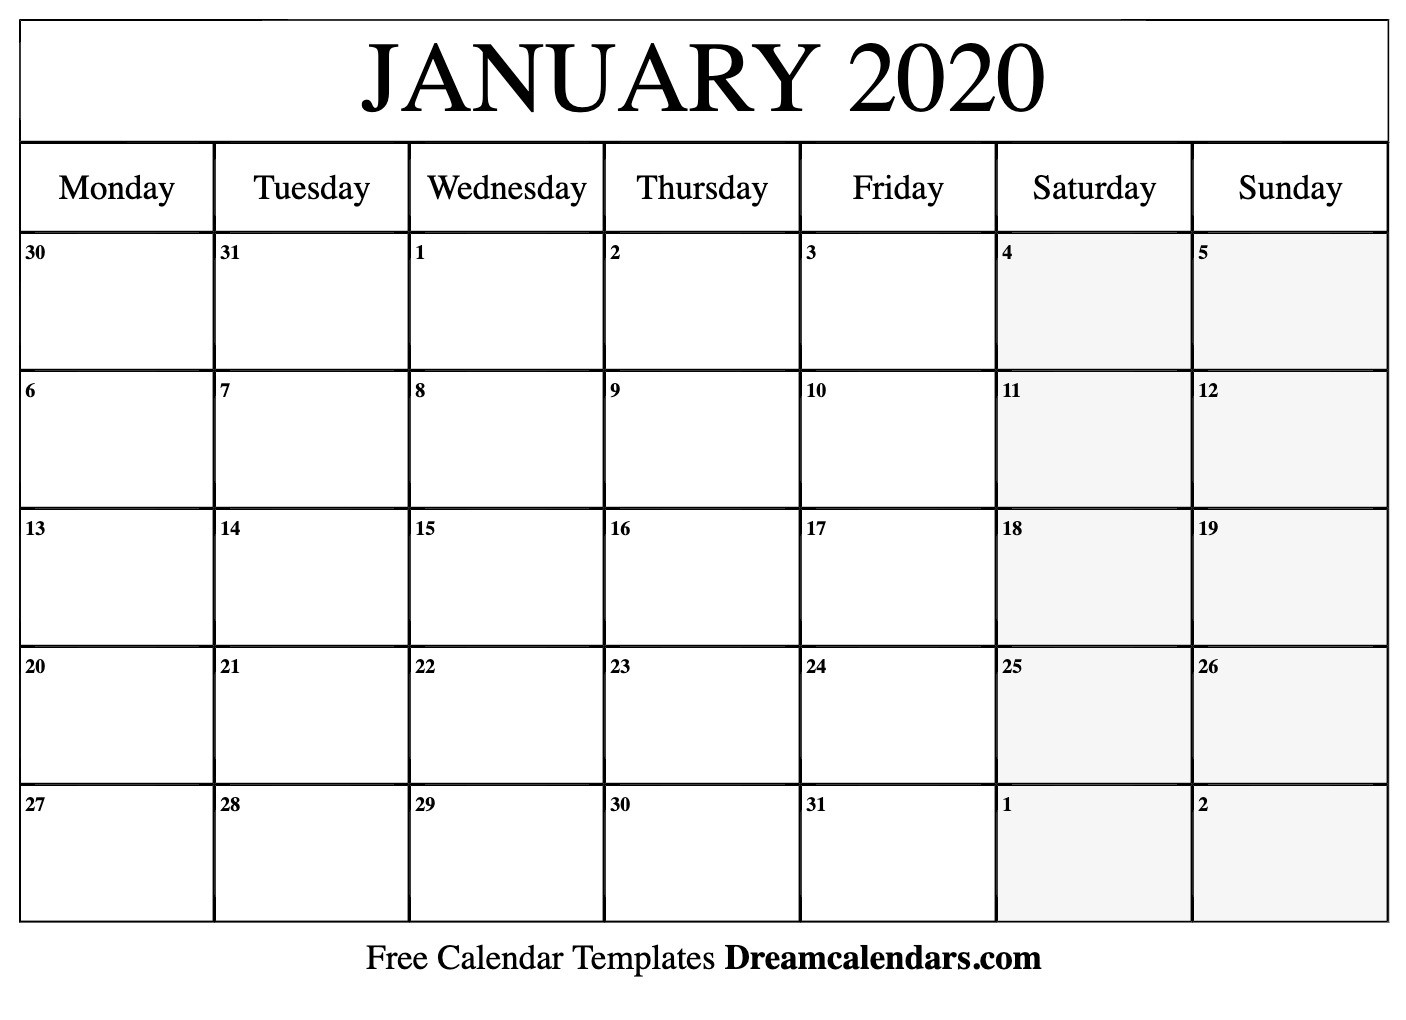 Printable January 2020 Calendar-January 2020 Calendar Free